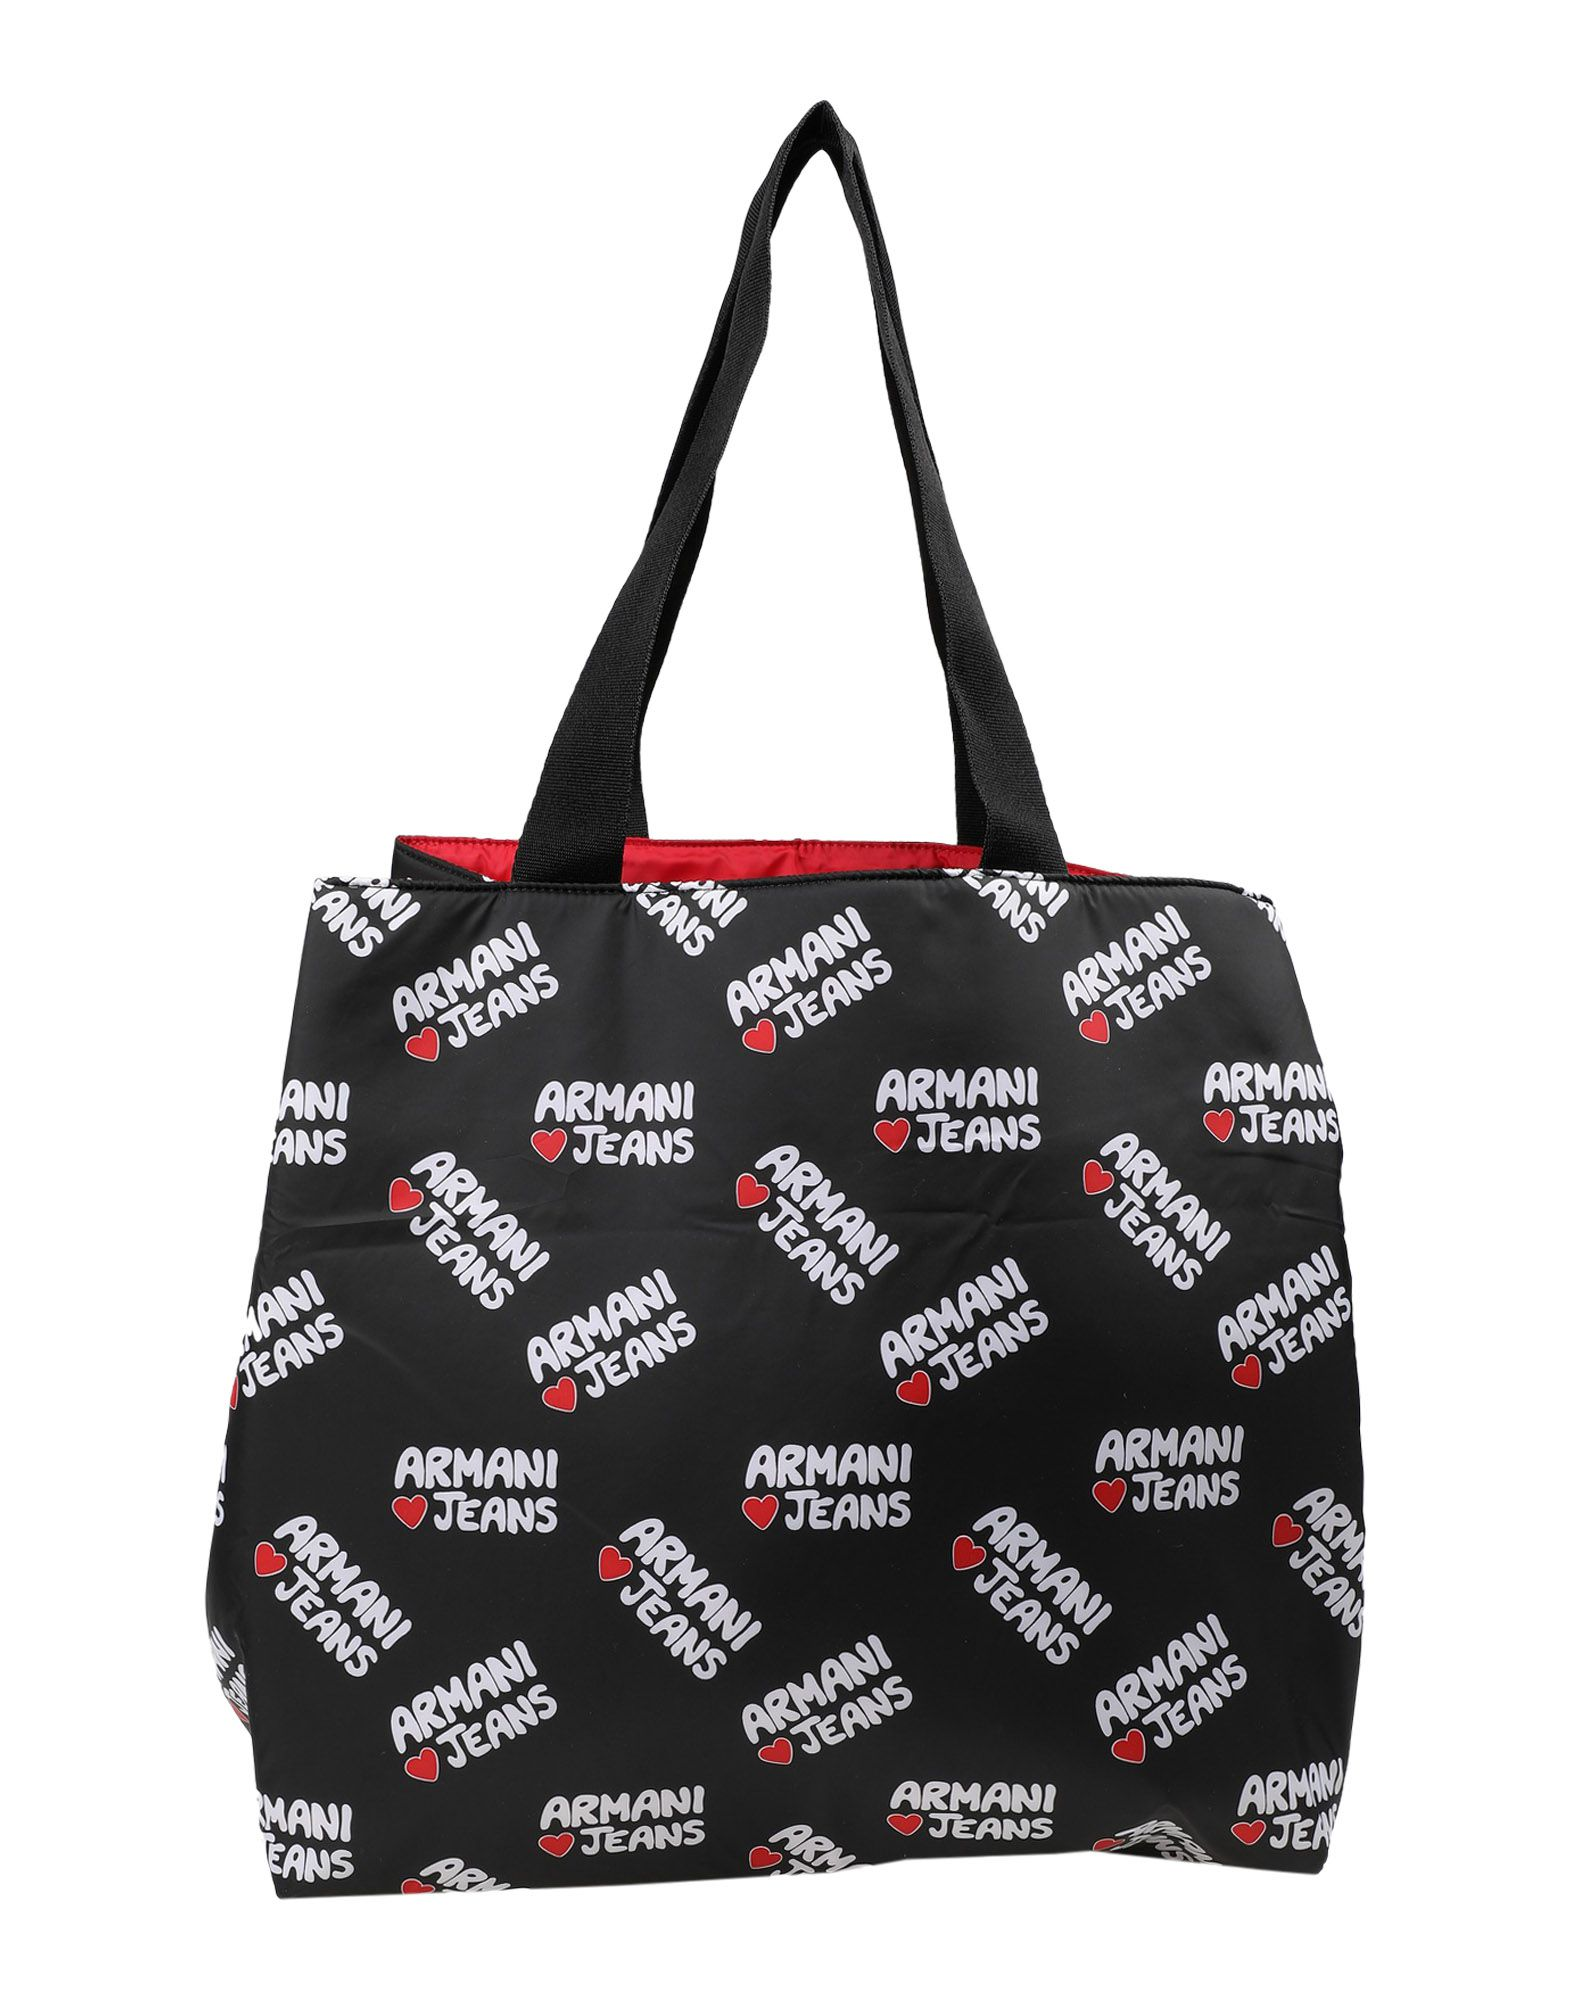 b9479c438811 Armani Jeans Handbags - Armani Jeans Women - YOOX United States